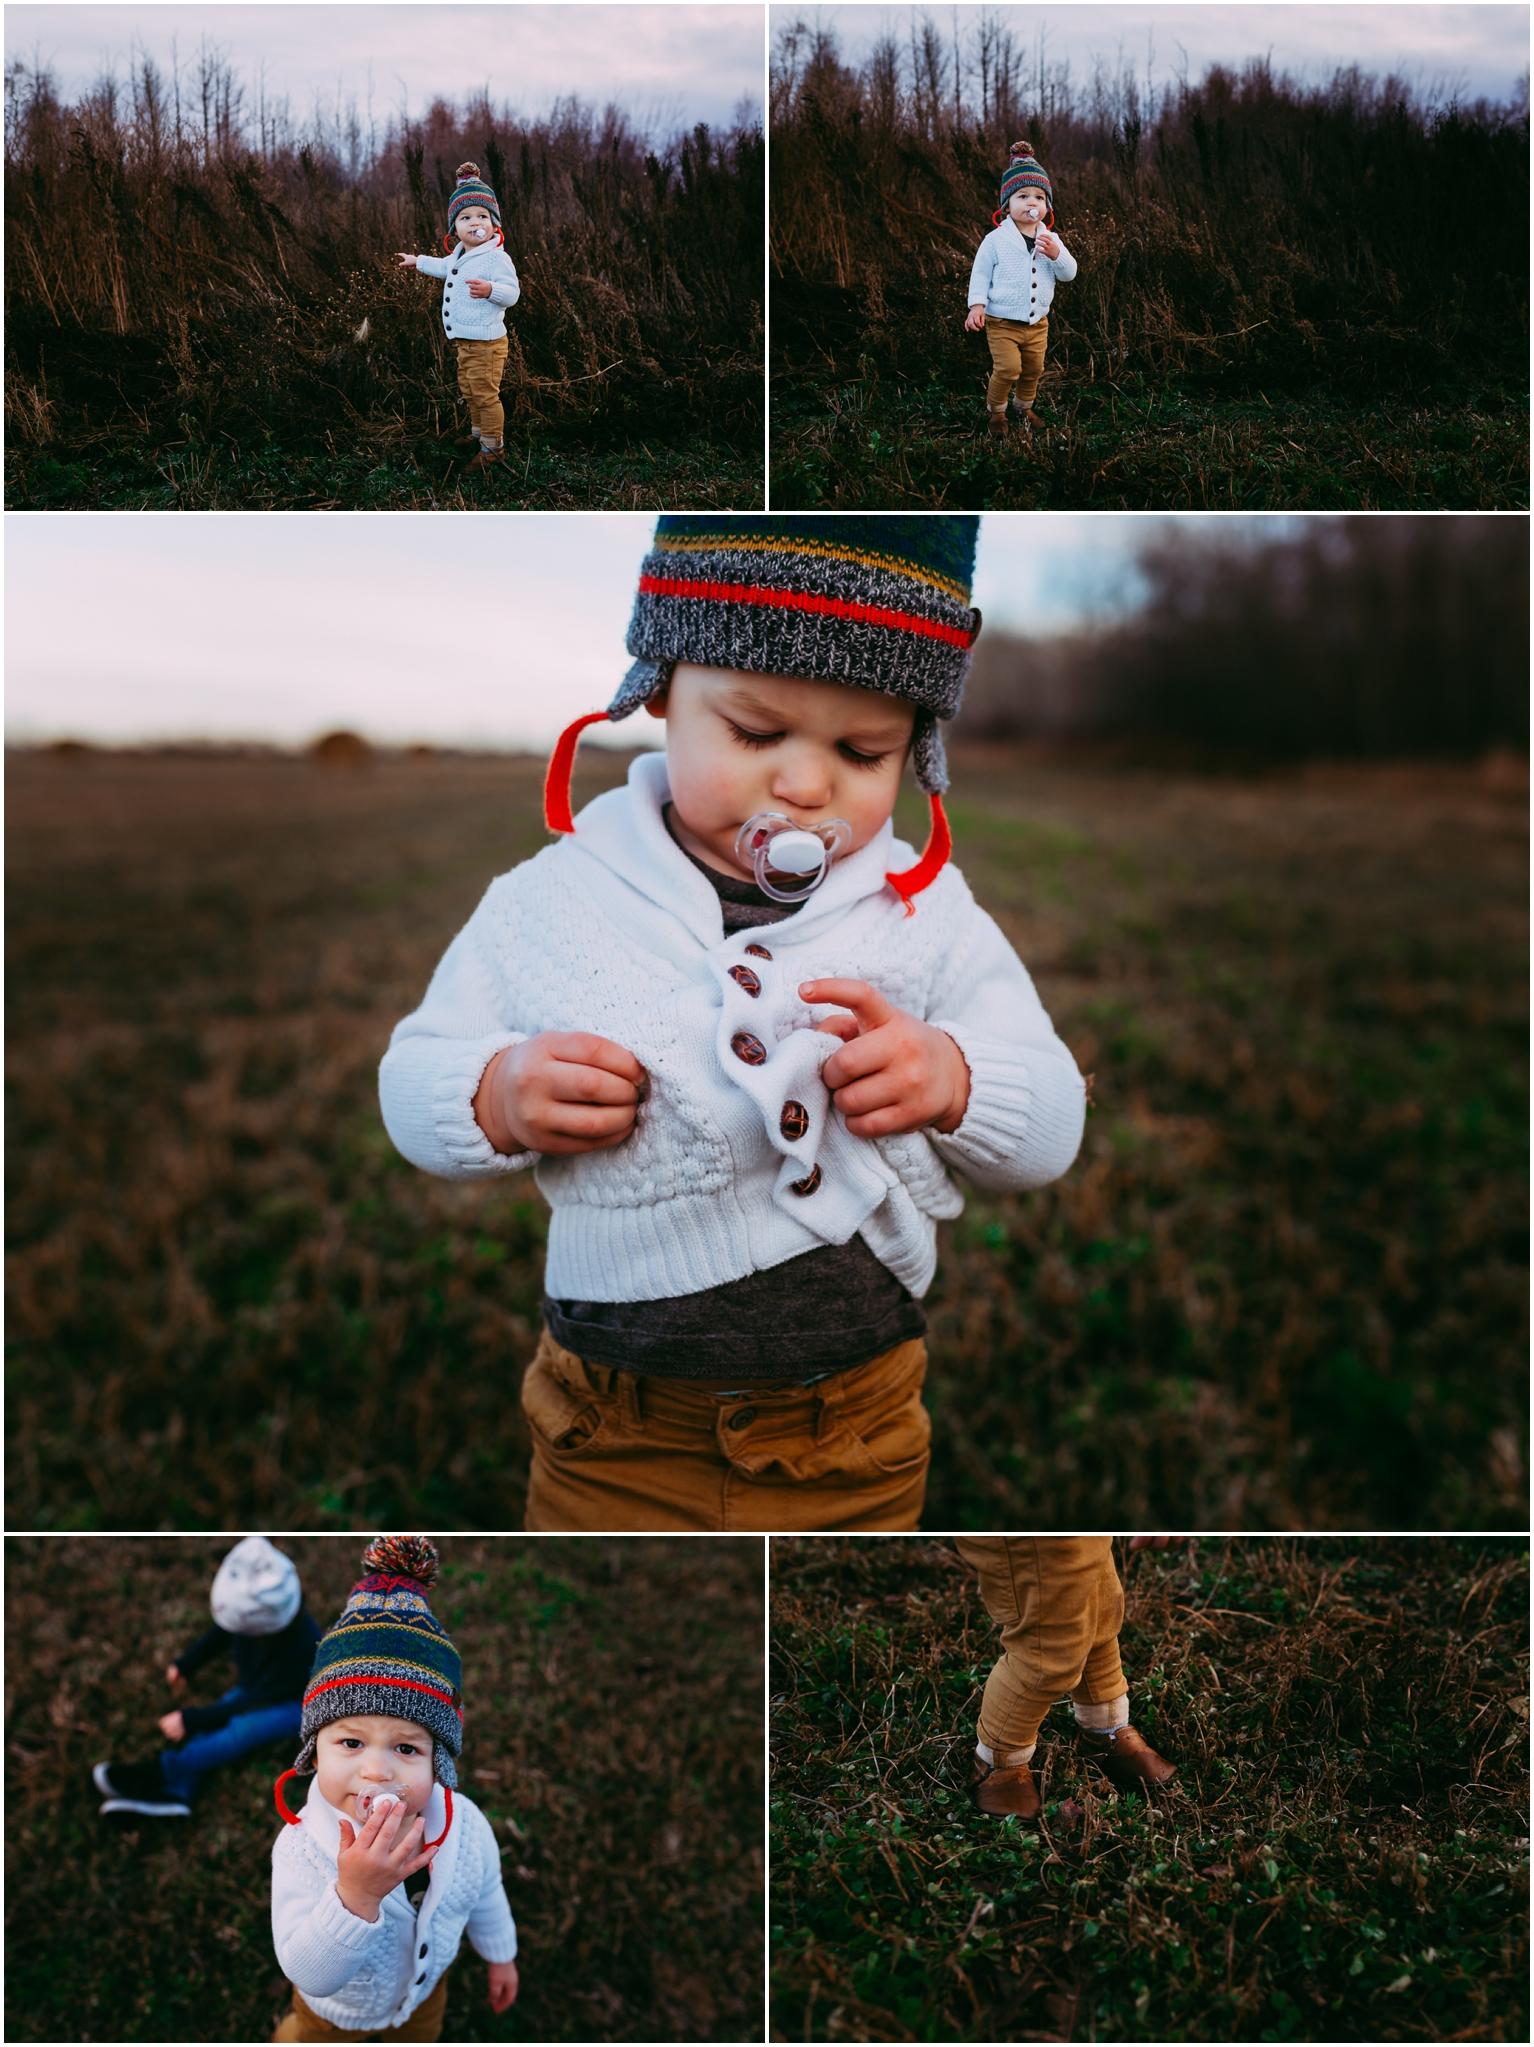 Edmonton Lifestyle Photographer - Treelines Photography - Best of 2016 - Toddler - Autumn